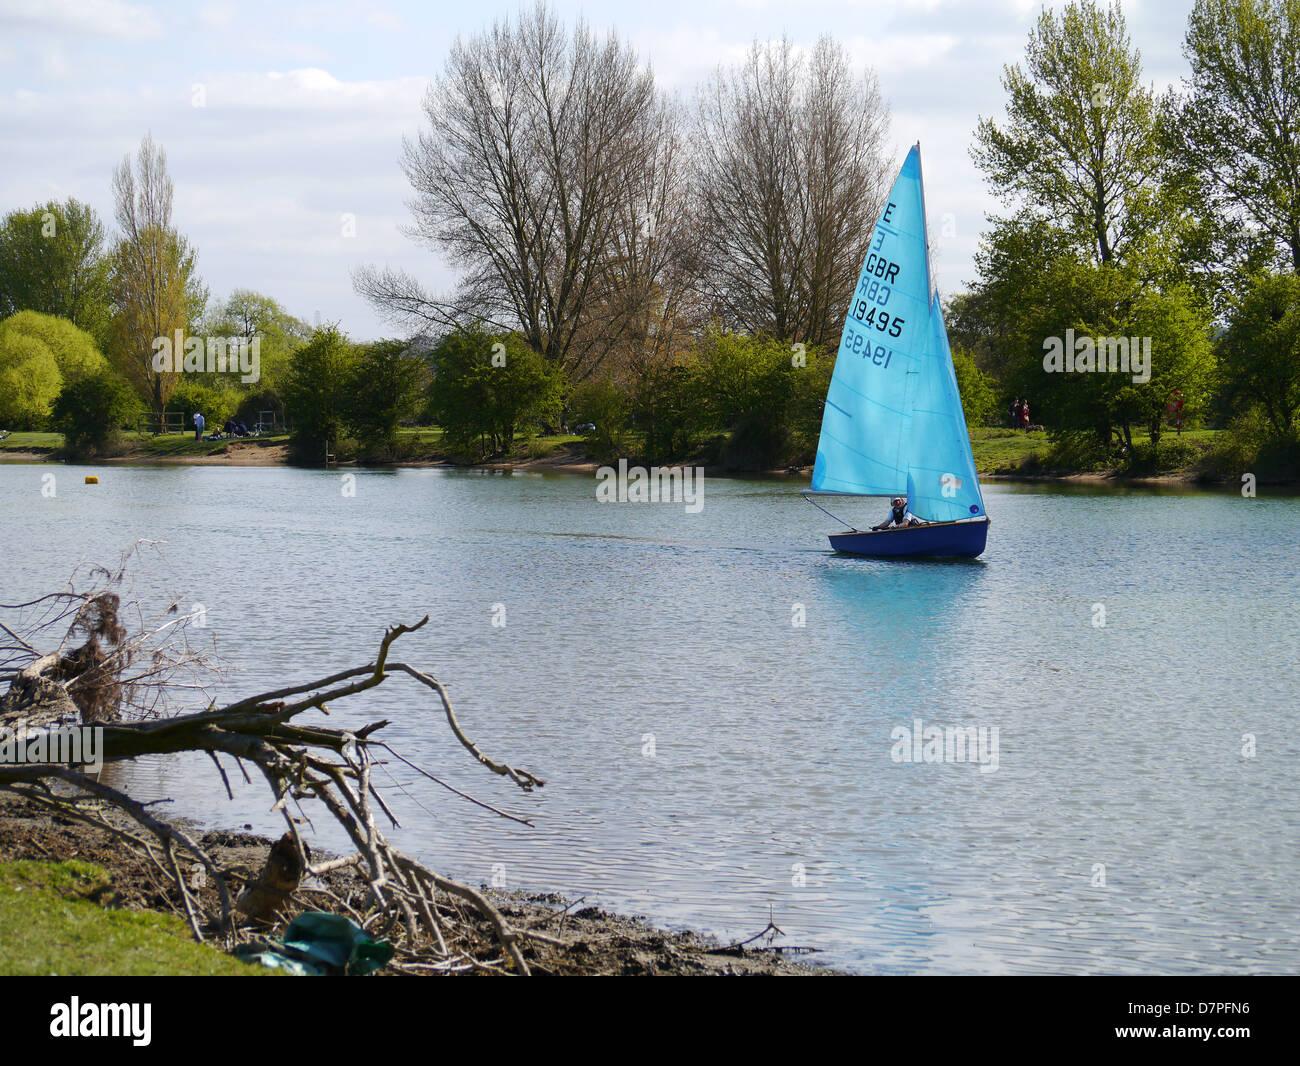 Medley Sailing Club Stock Photos & Medley Sailing Club Stock